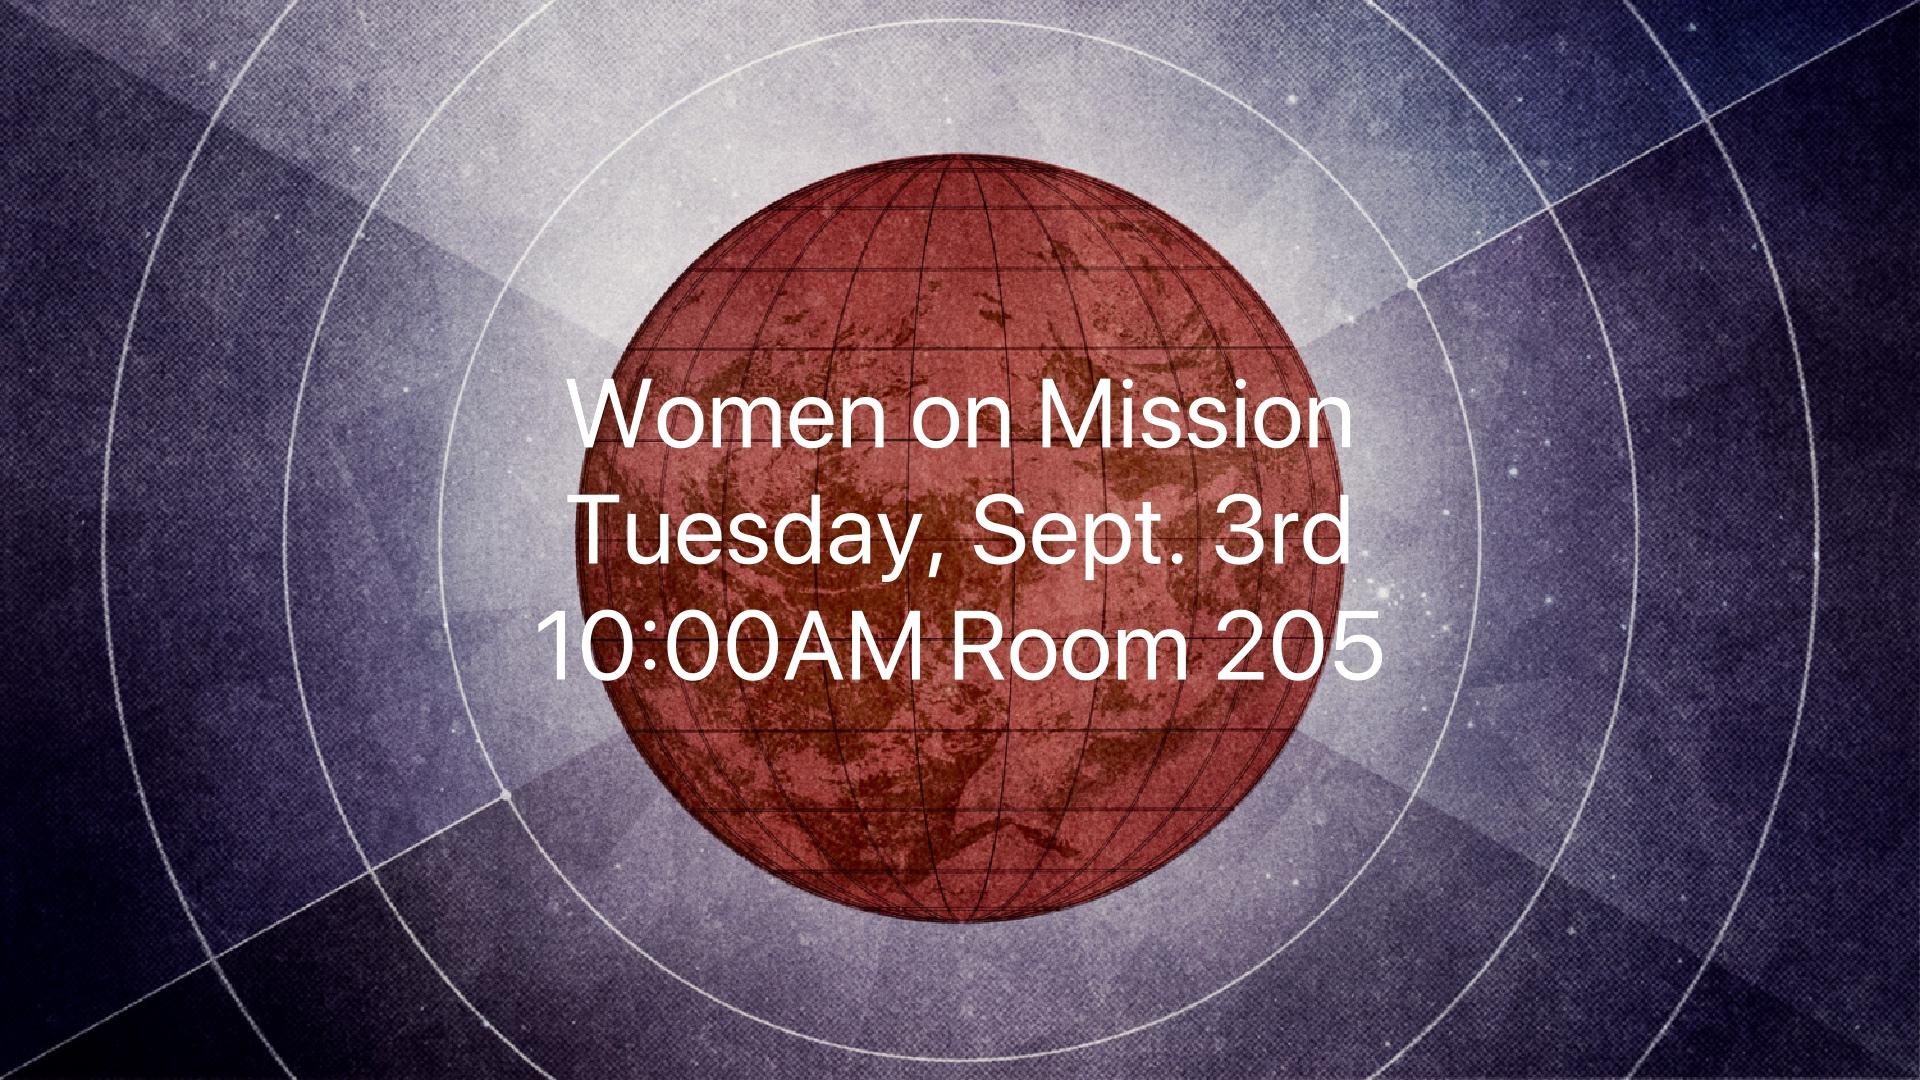 missions_globe_upcoming_events-title-3-still-16x9_Fotor.jpg